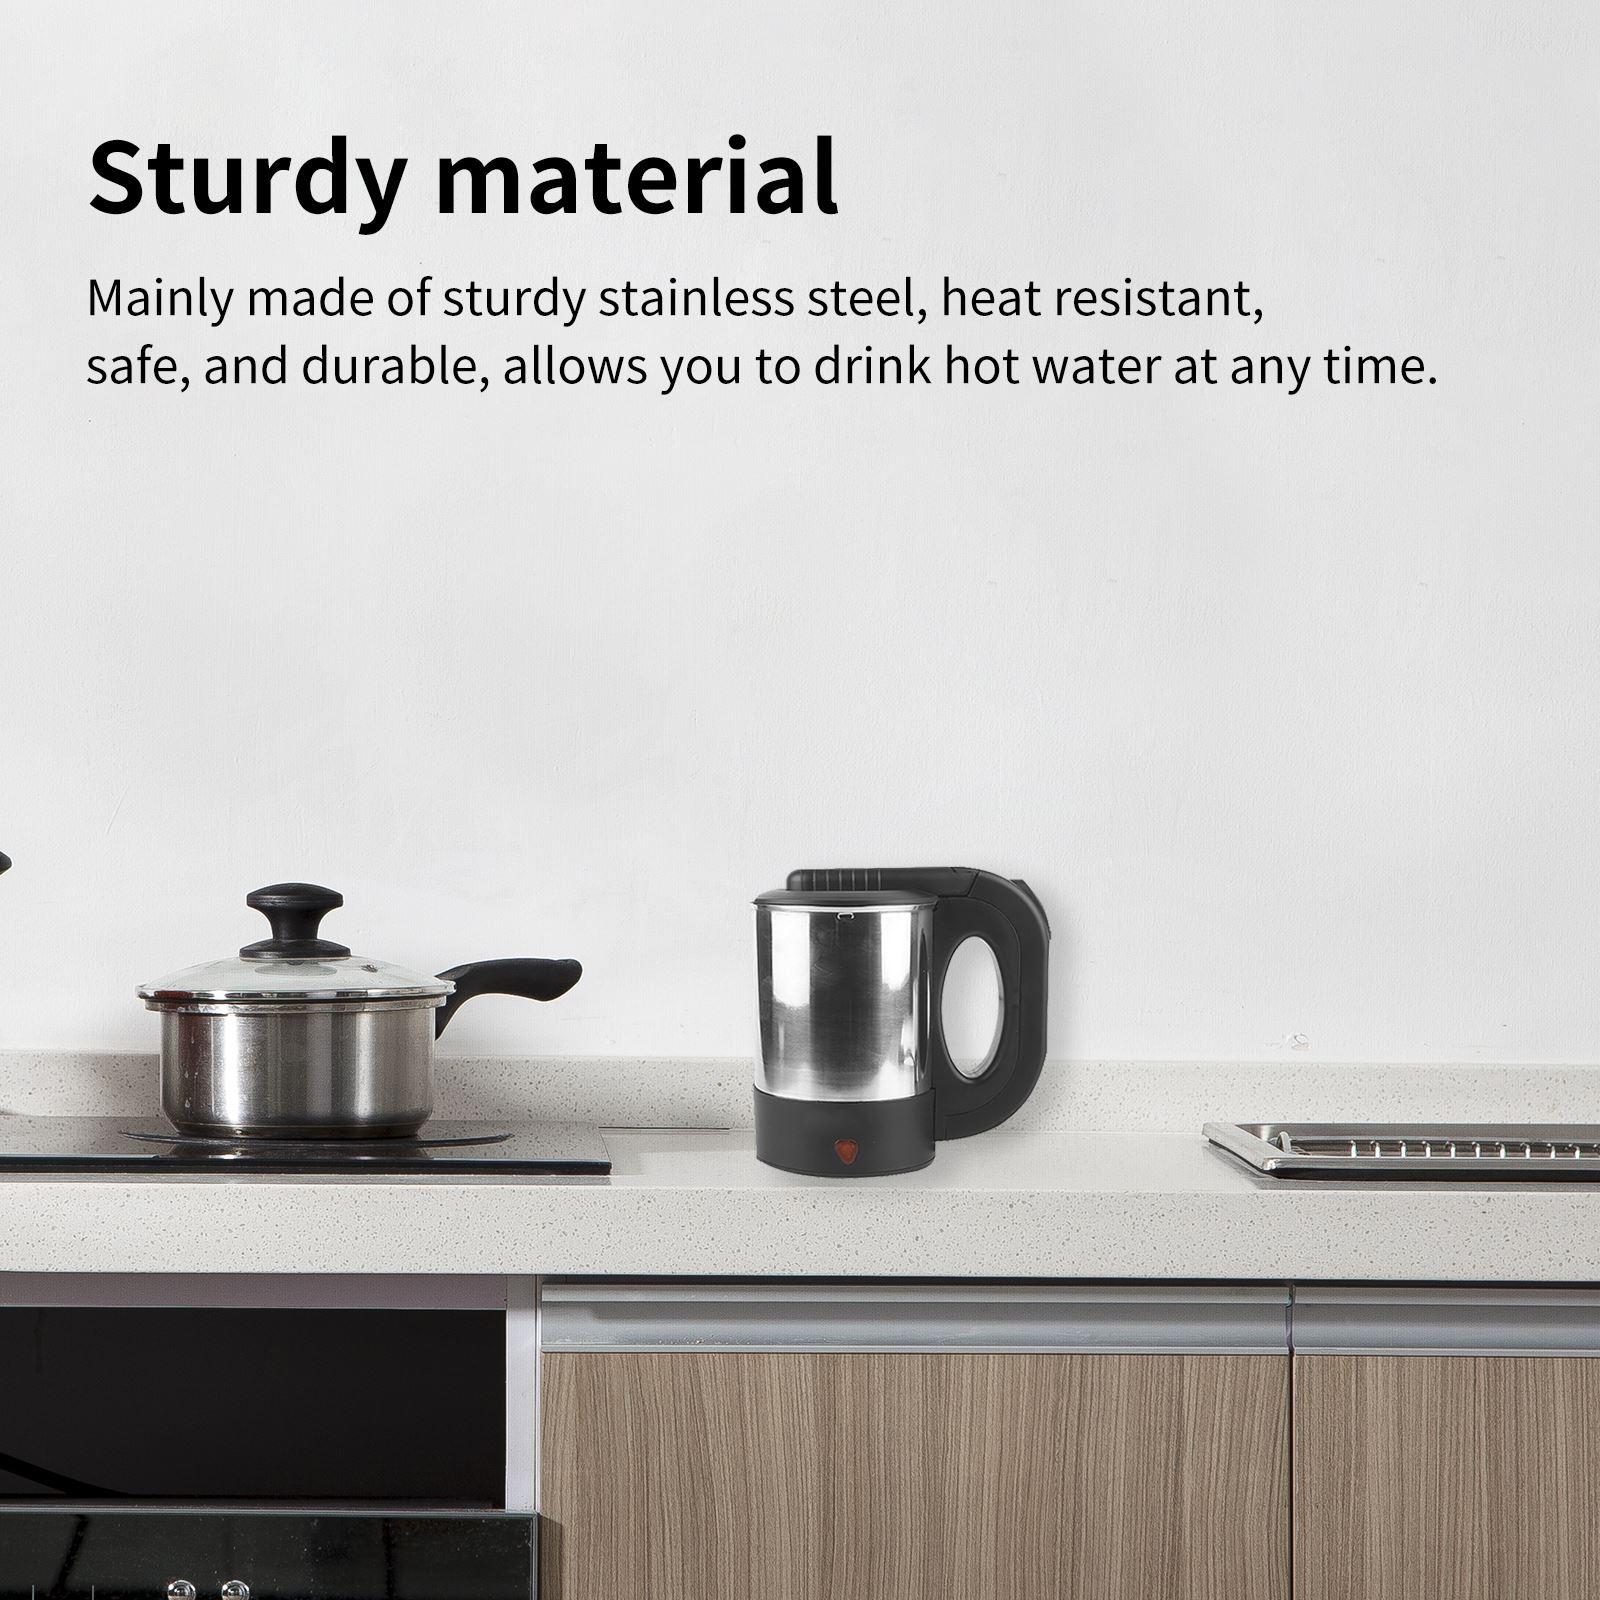 2021 new hot sale Electric Kettle Tea Coffee Thermo Pot Appliances Kitchen Smart Kettle Portable Travel Water Boiler Pot Sonifer